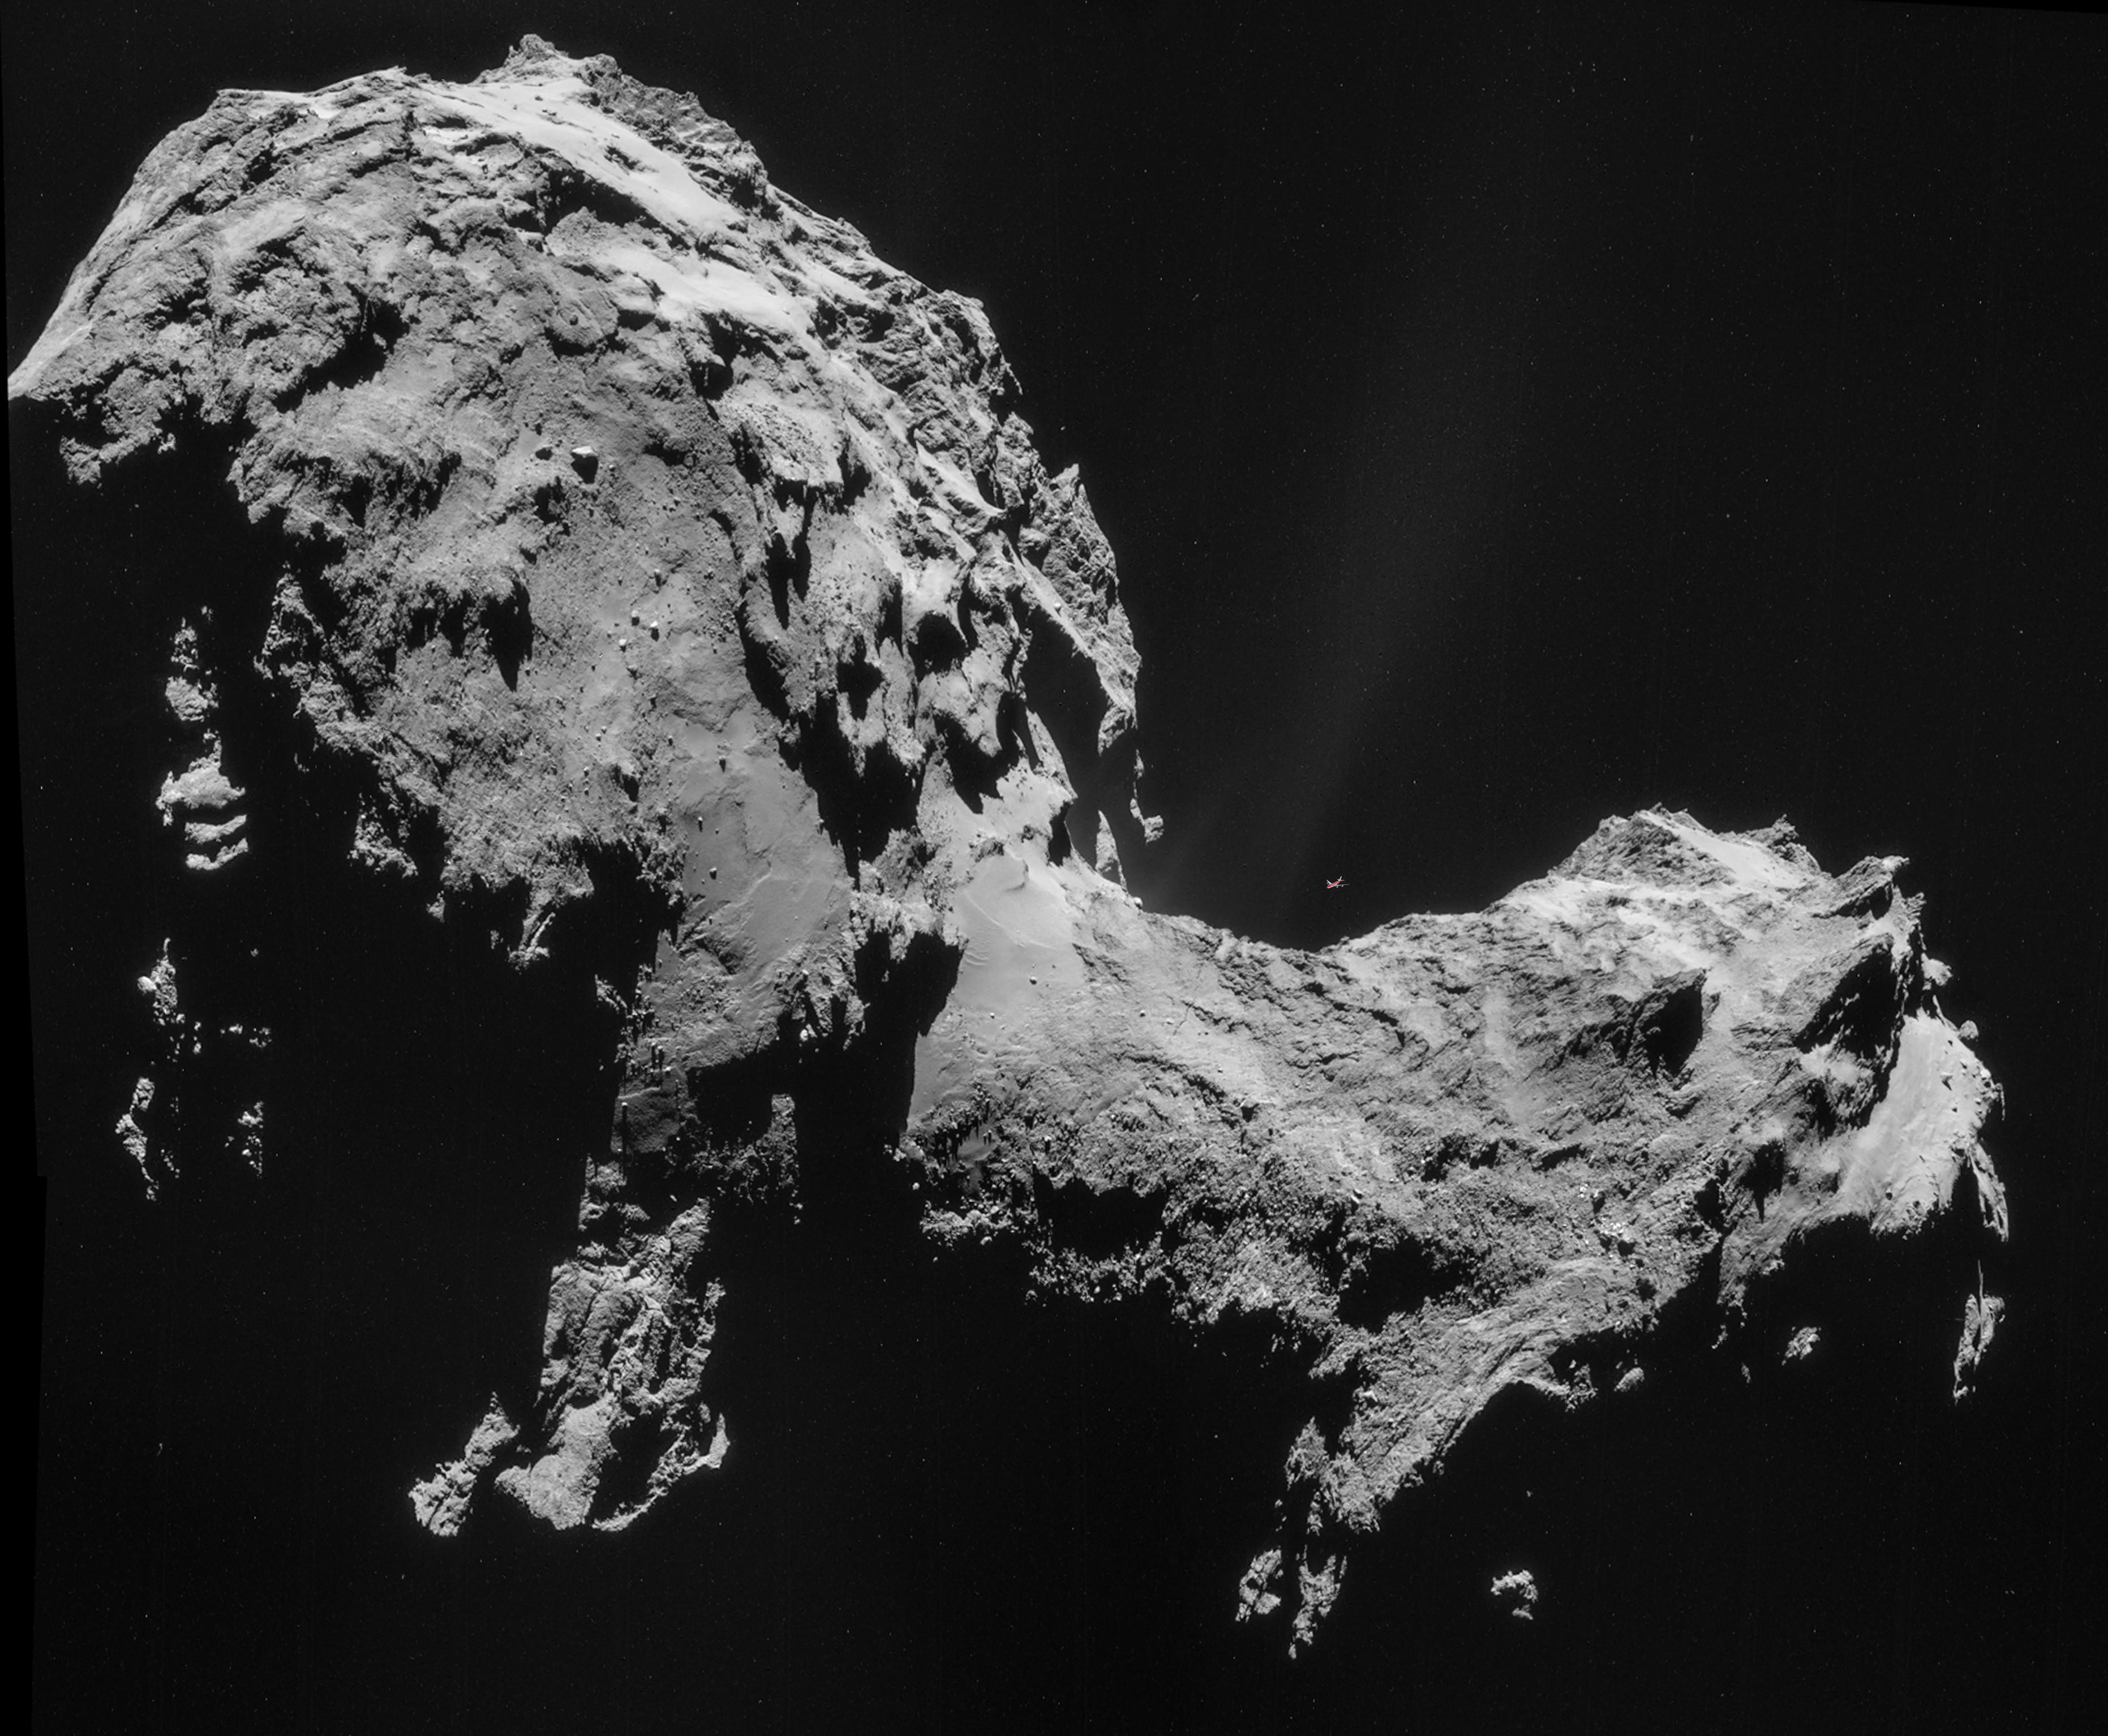 nucleo cometa